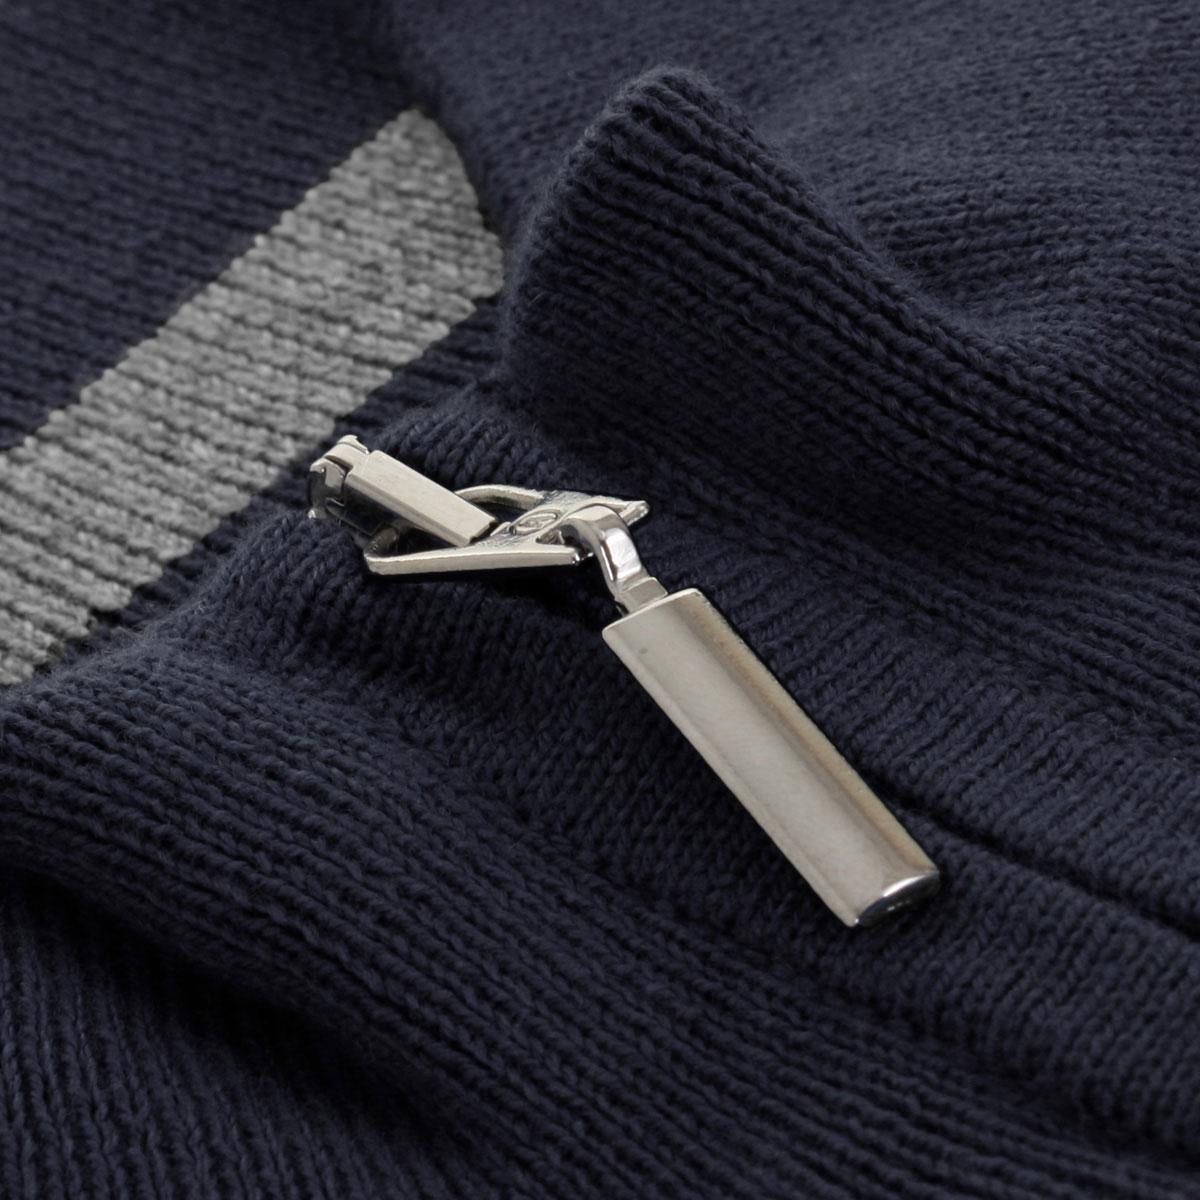 Calvin-Klein-Golf-Mens-CK-1-4-Zip-Sleeveless-Sweater-Vest-Gilet-27-OFF-RRP thumbnail 19